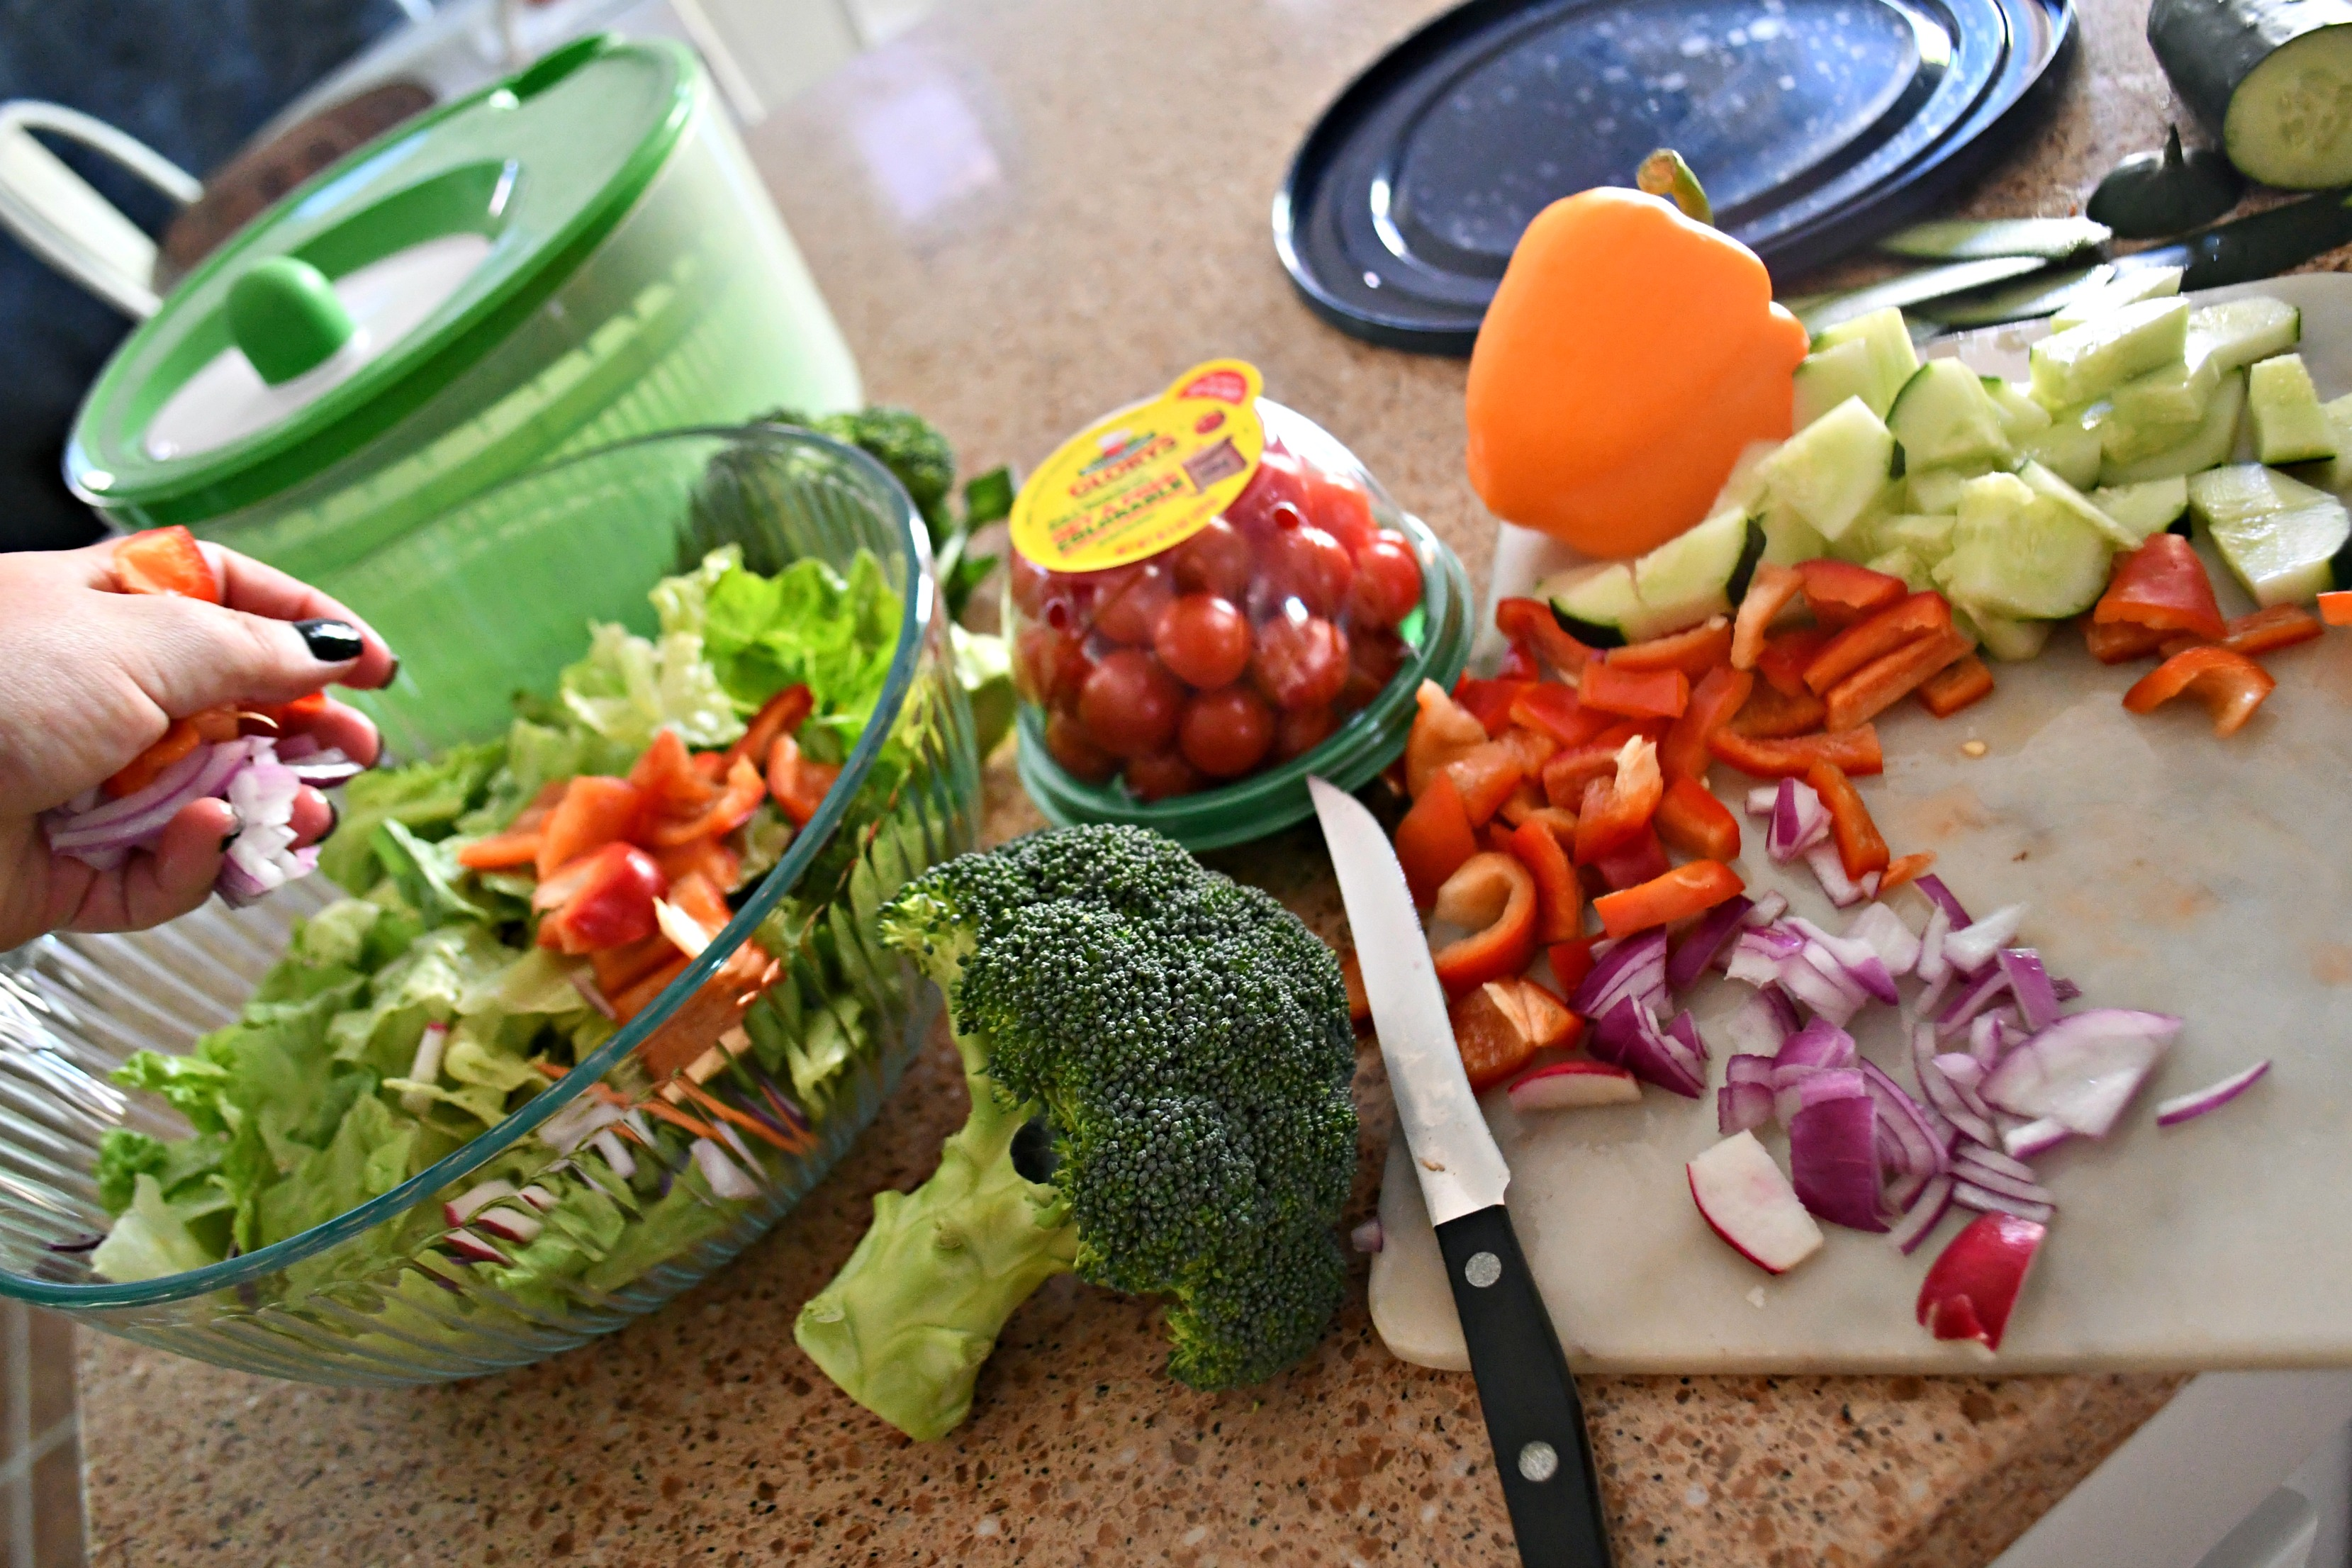 Weekly Sunday Salad Prep and my favorite dressing recipe ingredients.